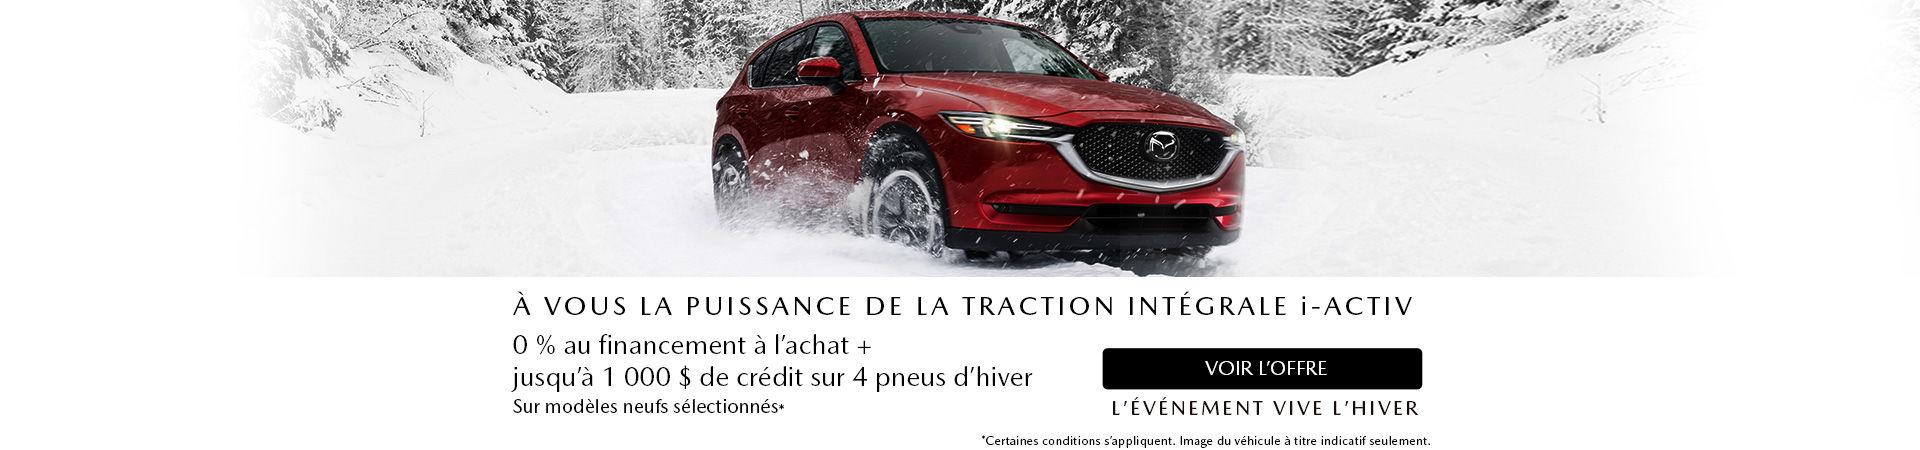 L'événement vive l'hiver Mazda